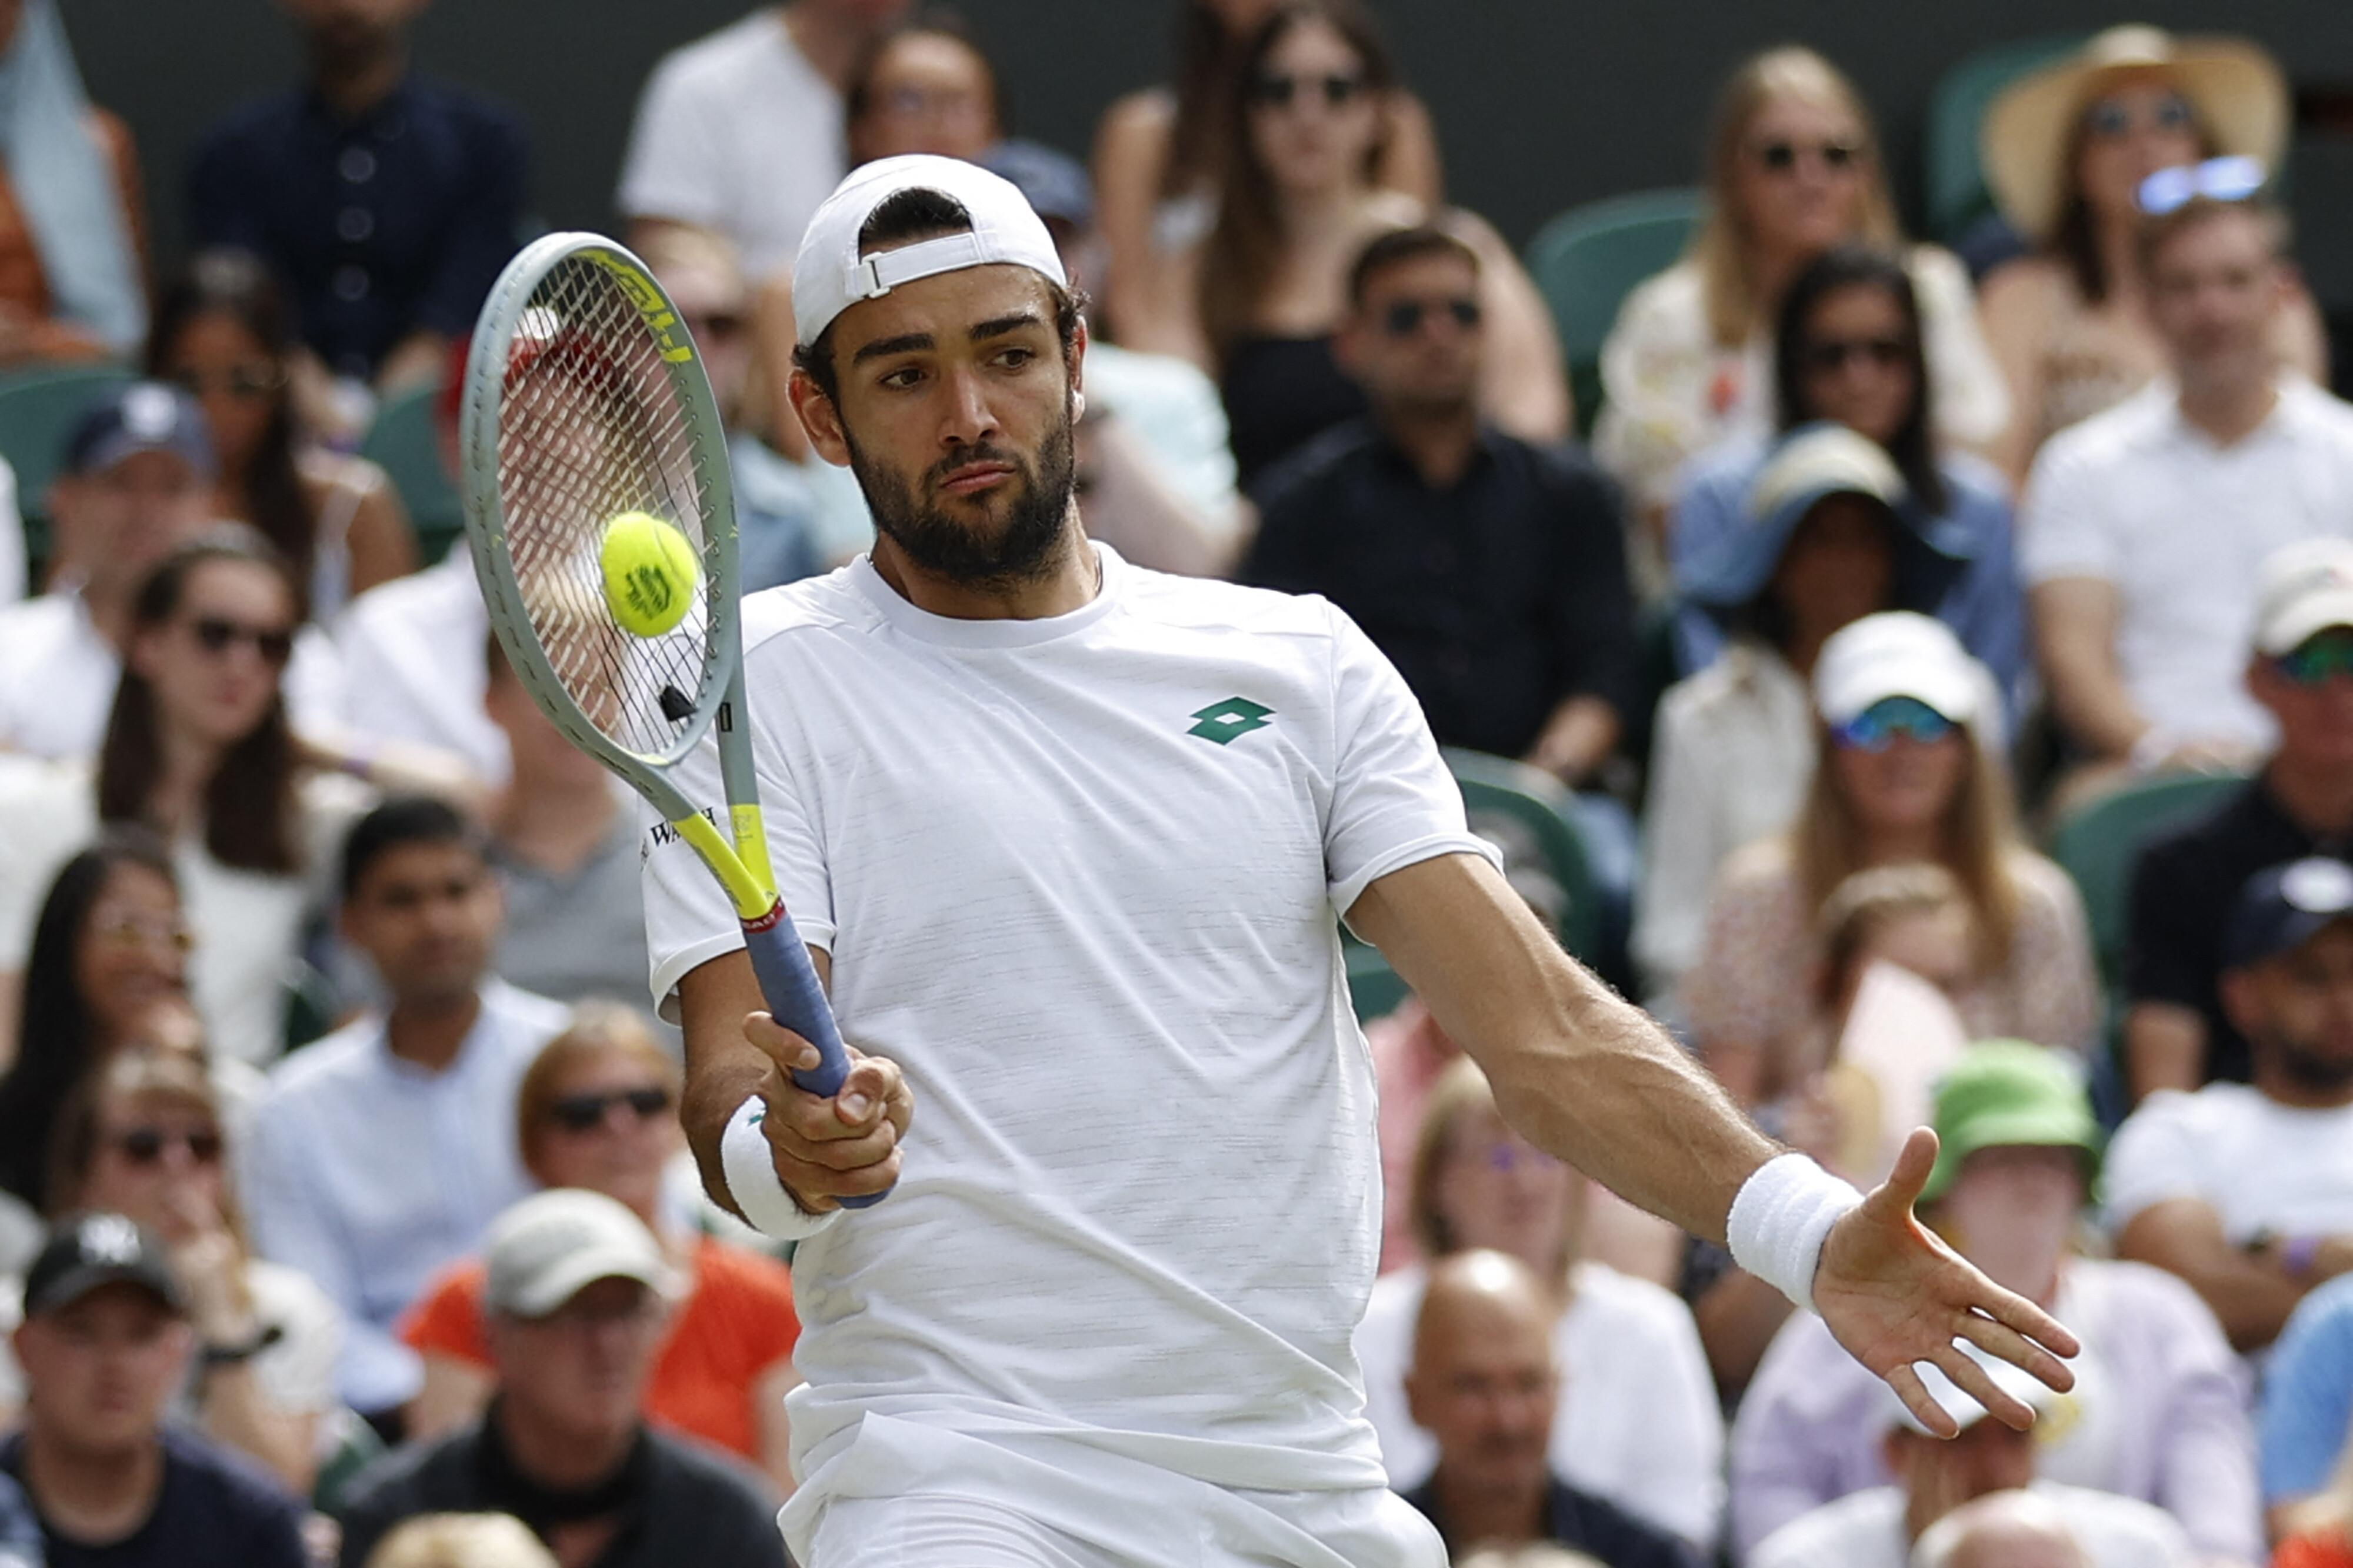 Matteo Berrettini beats Hubert Hurkacz to become first Italian man to reach a Wimbledon final